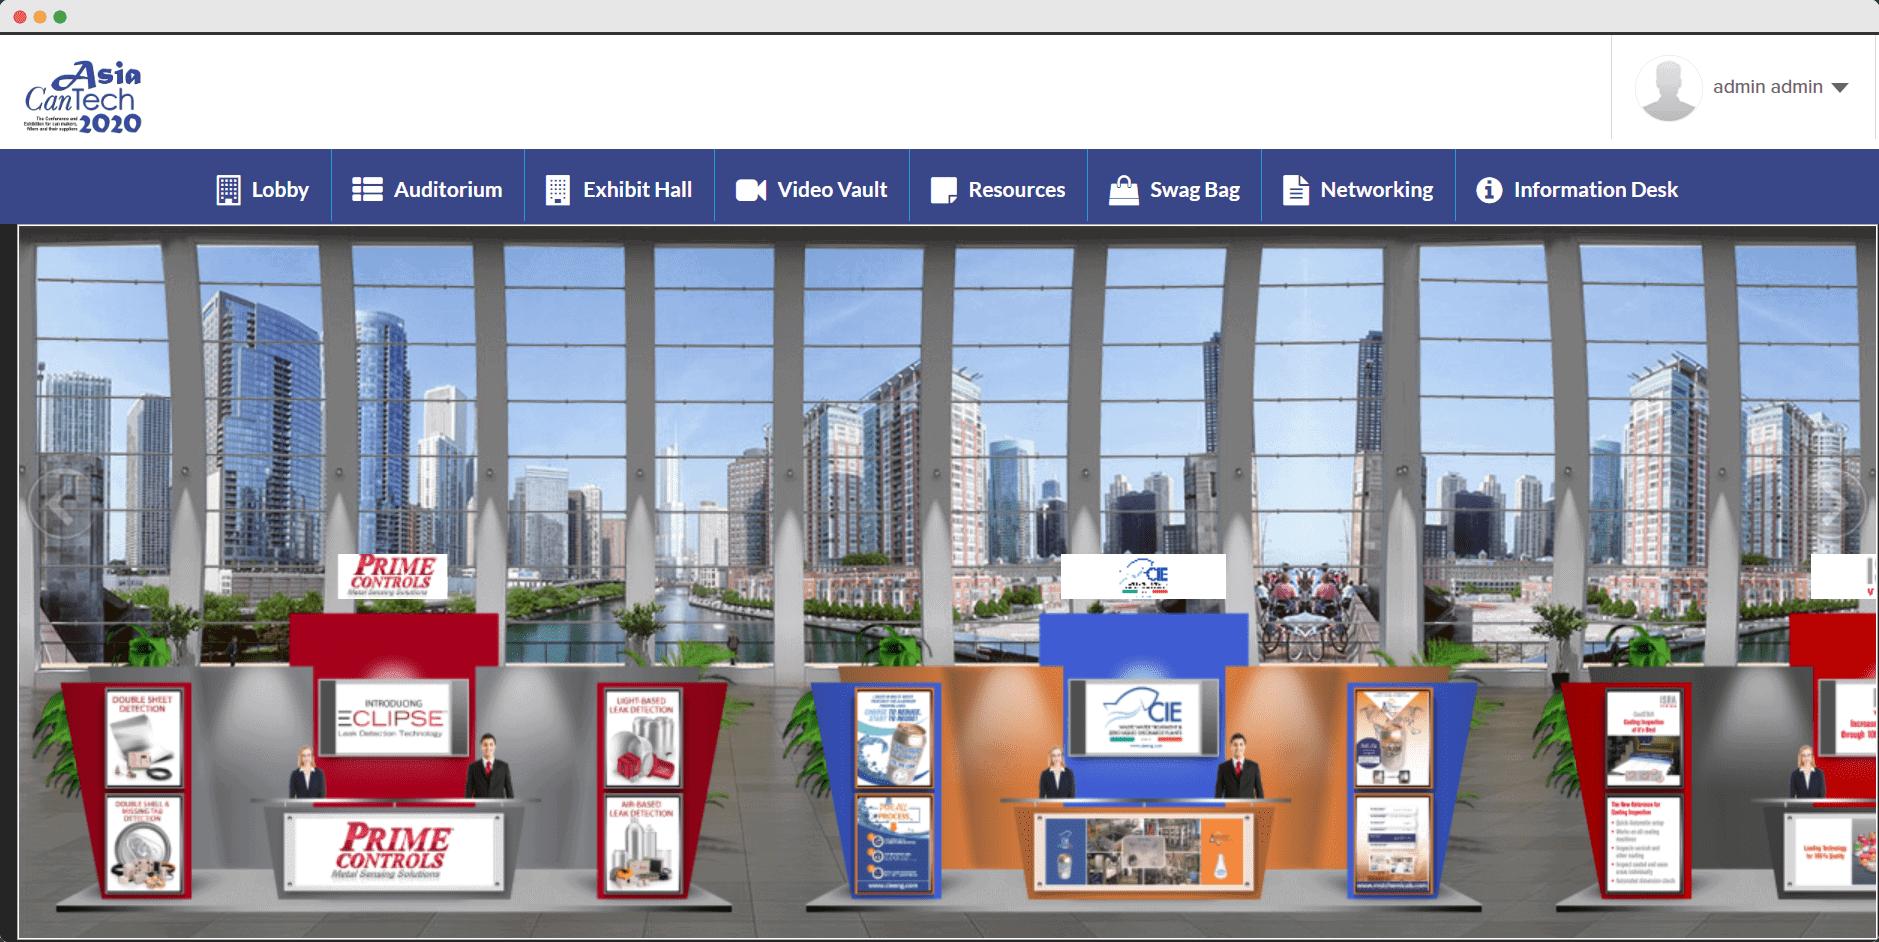 Asia CanTech virtual conference exhibit hall